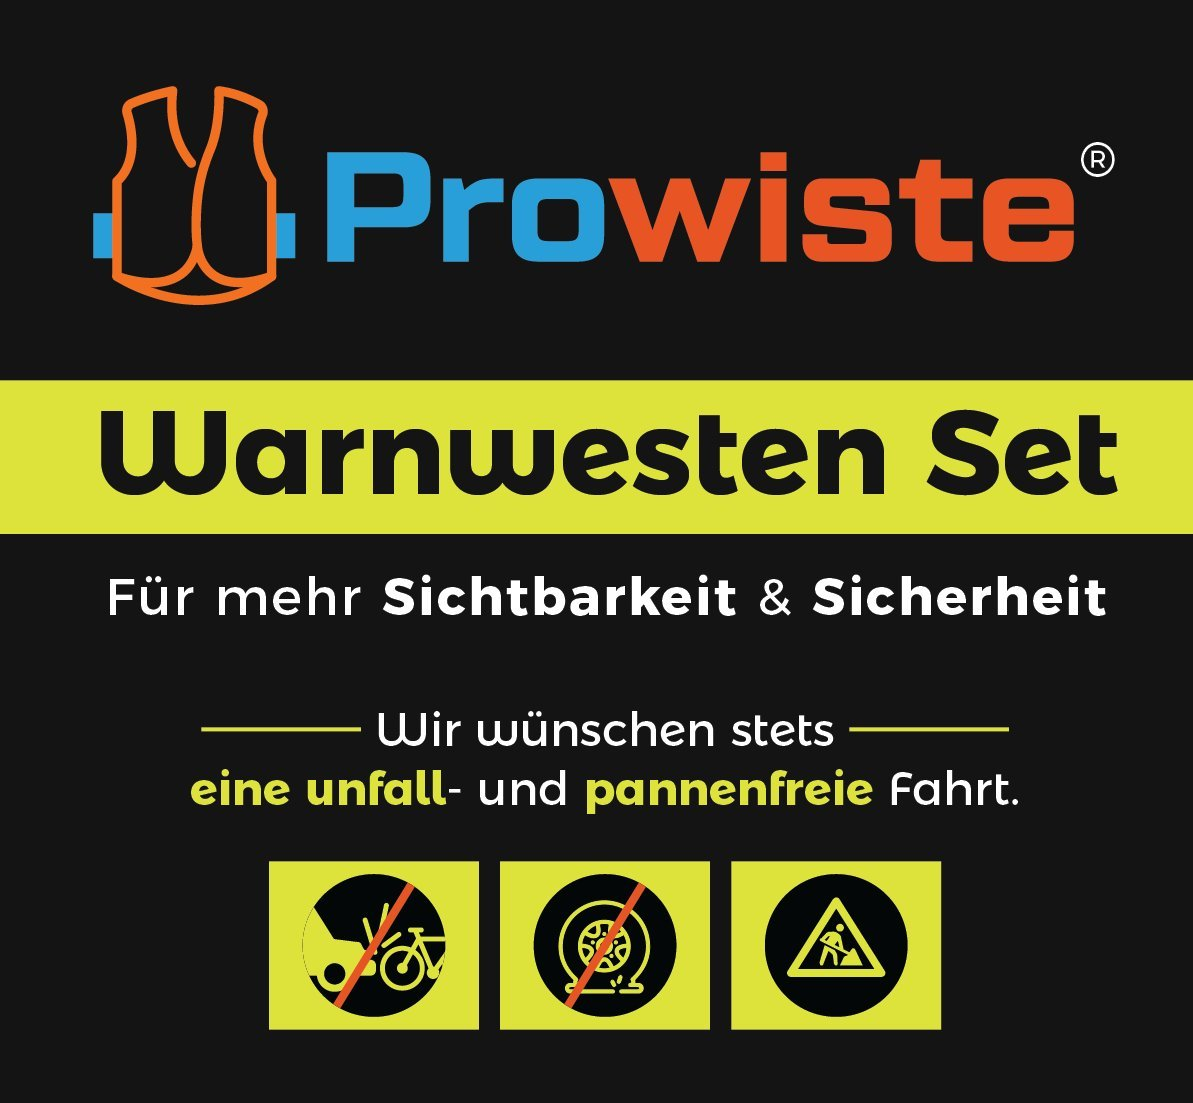 Set of 4/Hi Viz Safety Vest Fluorescent Yellow High Visibility Vest EN 471/Accident Car Star Line Crease Resistant Washable/ /Safety Vest with Reflective Stripes and Velcro Closure Universal Size